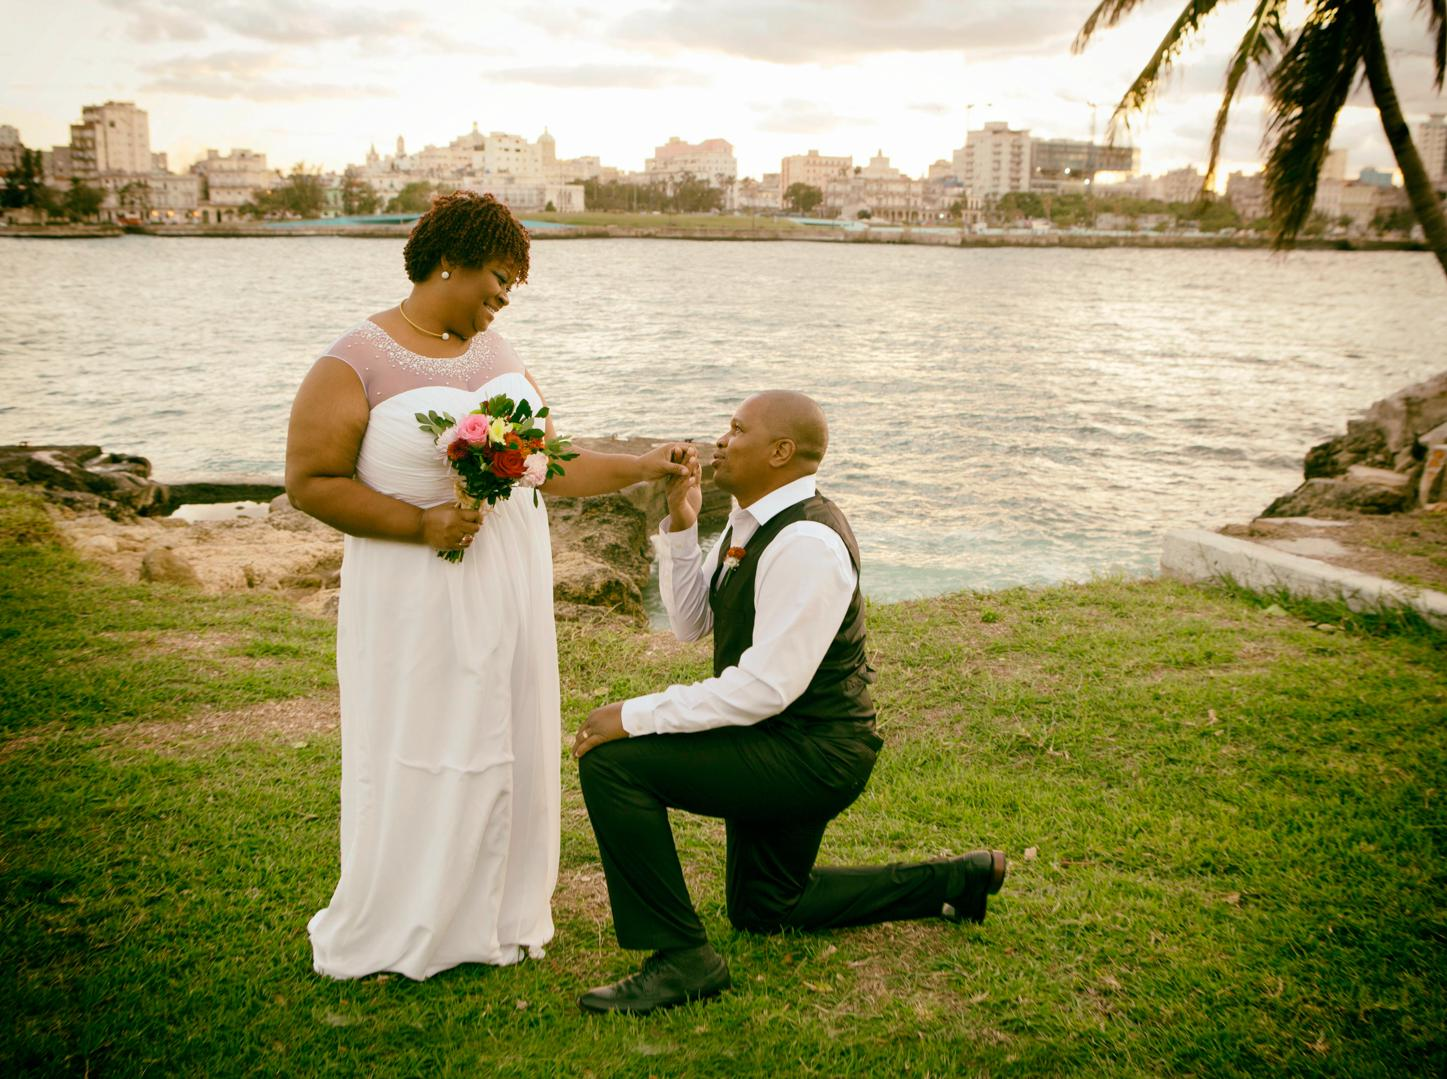 bodas-sin-clasificar-sin-tema-cuba-42171.jpg